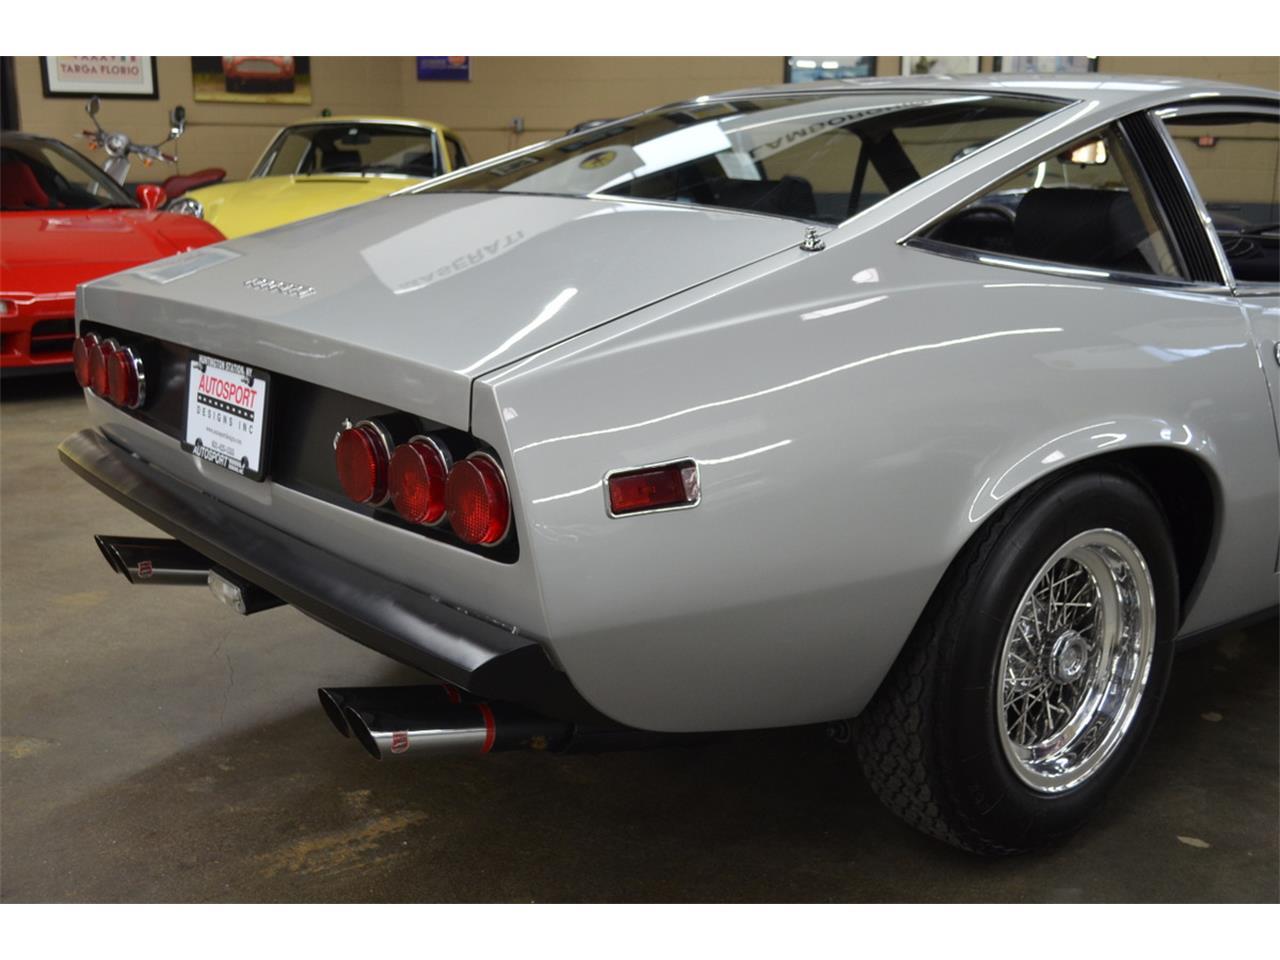 1972 Ferrari 365 GT4 (CC-1415945) for sale in Huntington Station, New York